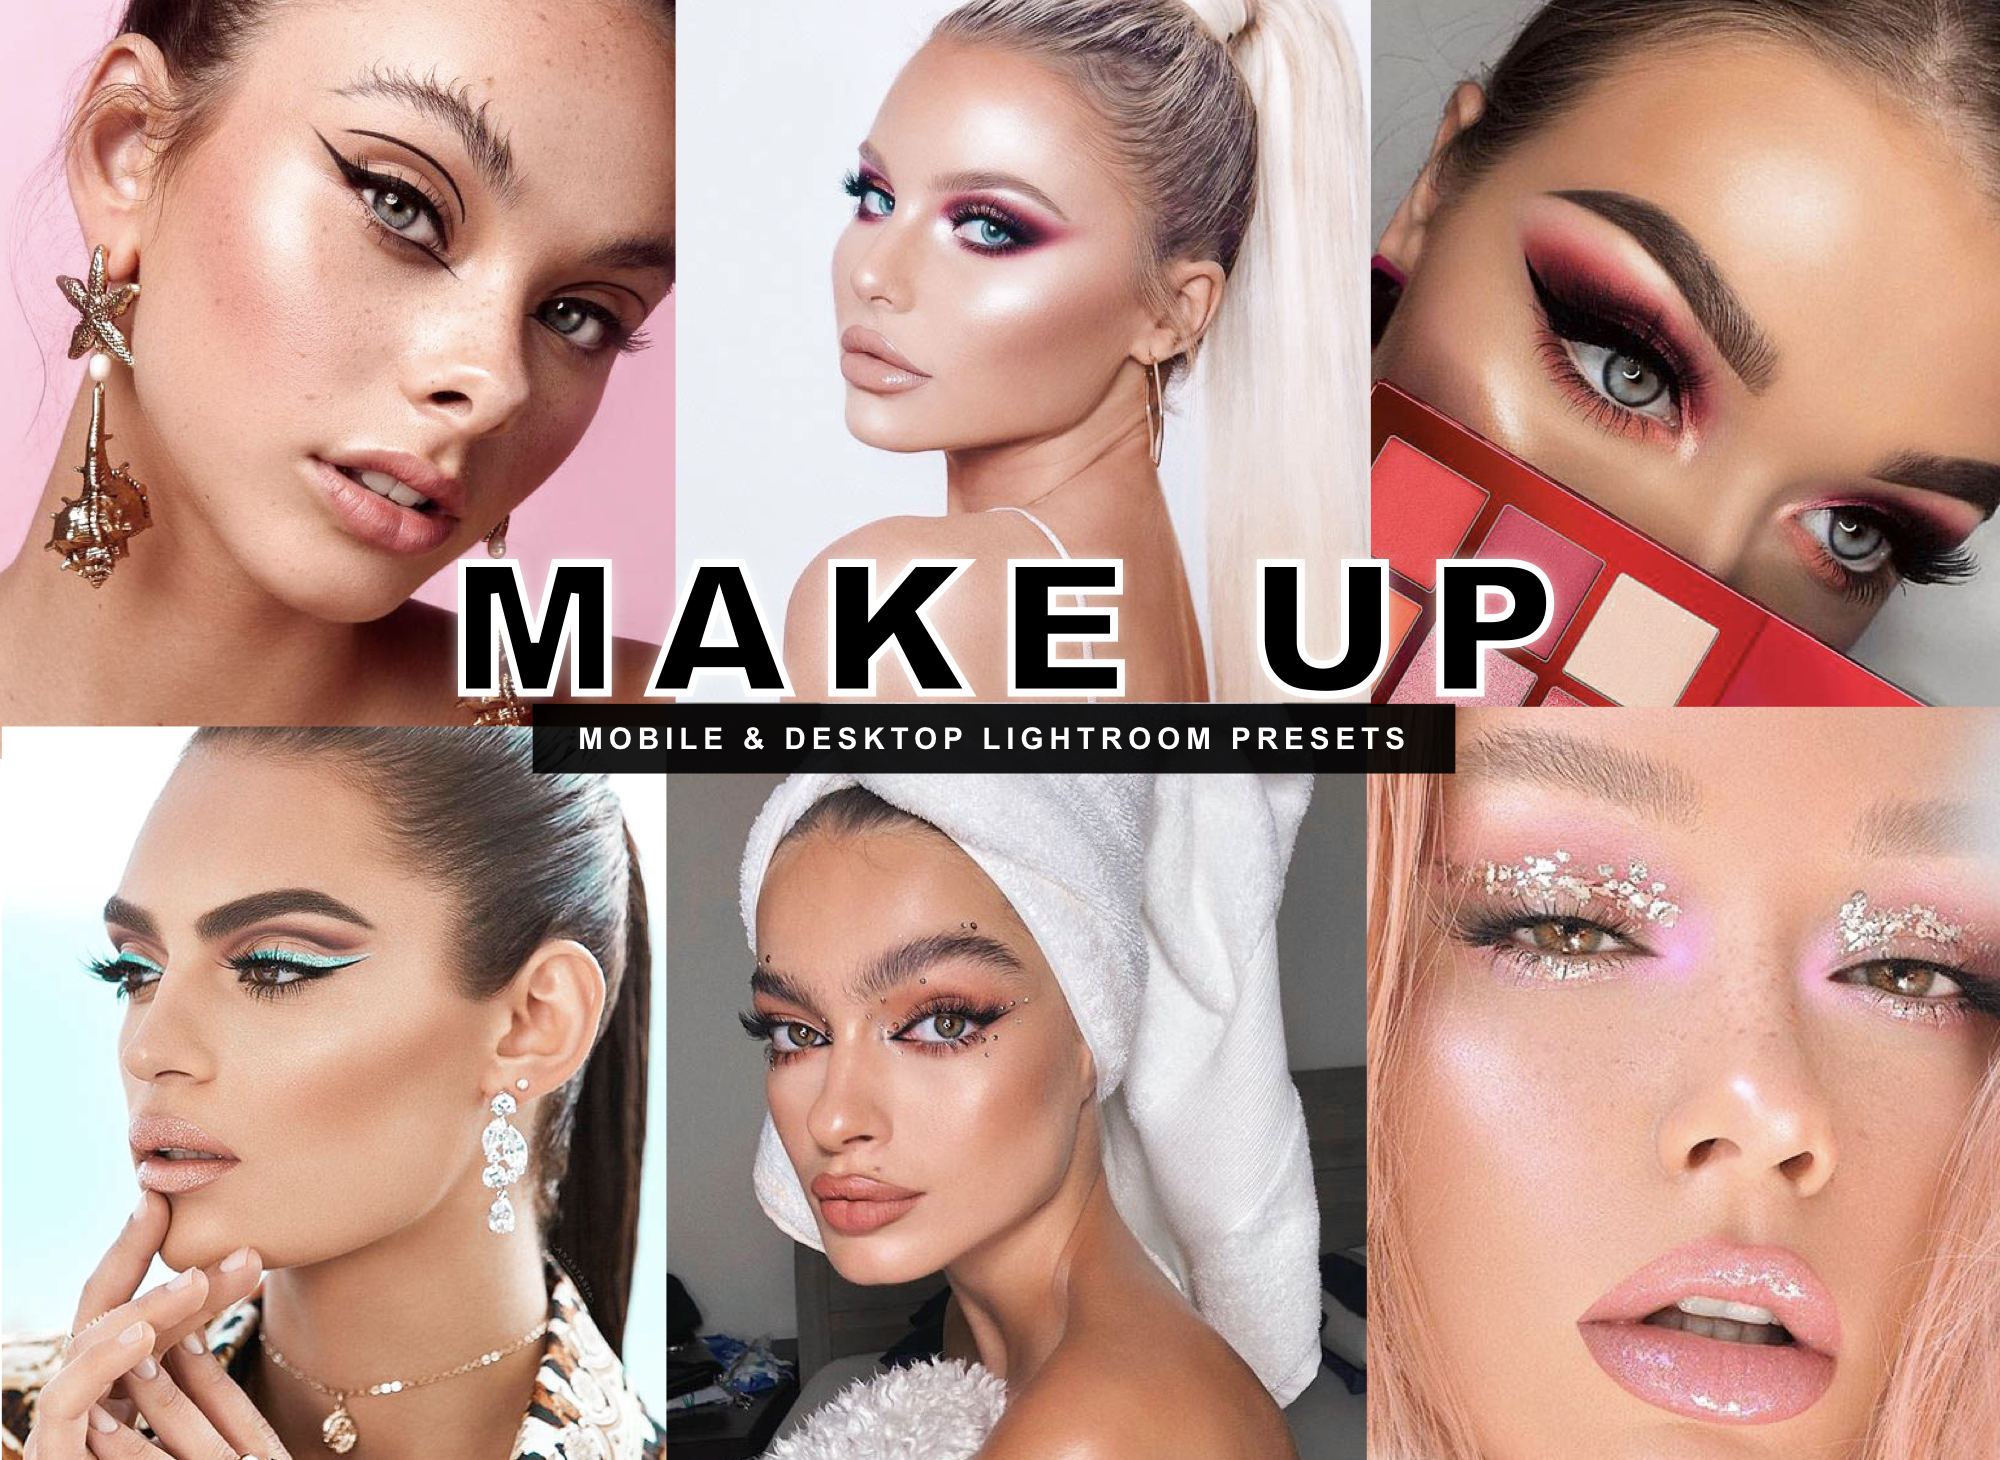 7 Makeup Mobile Lightroom Presets for Beauty Bloggers